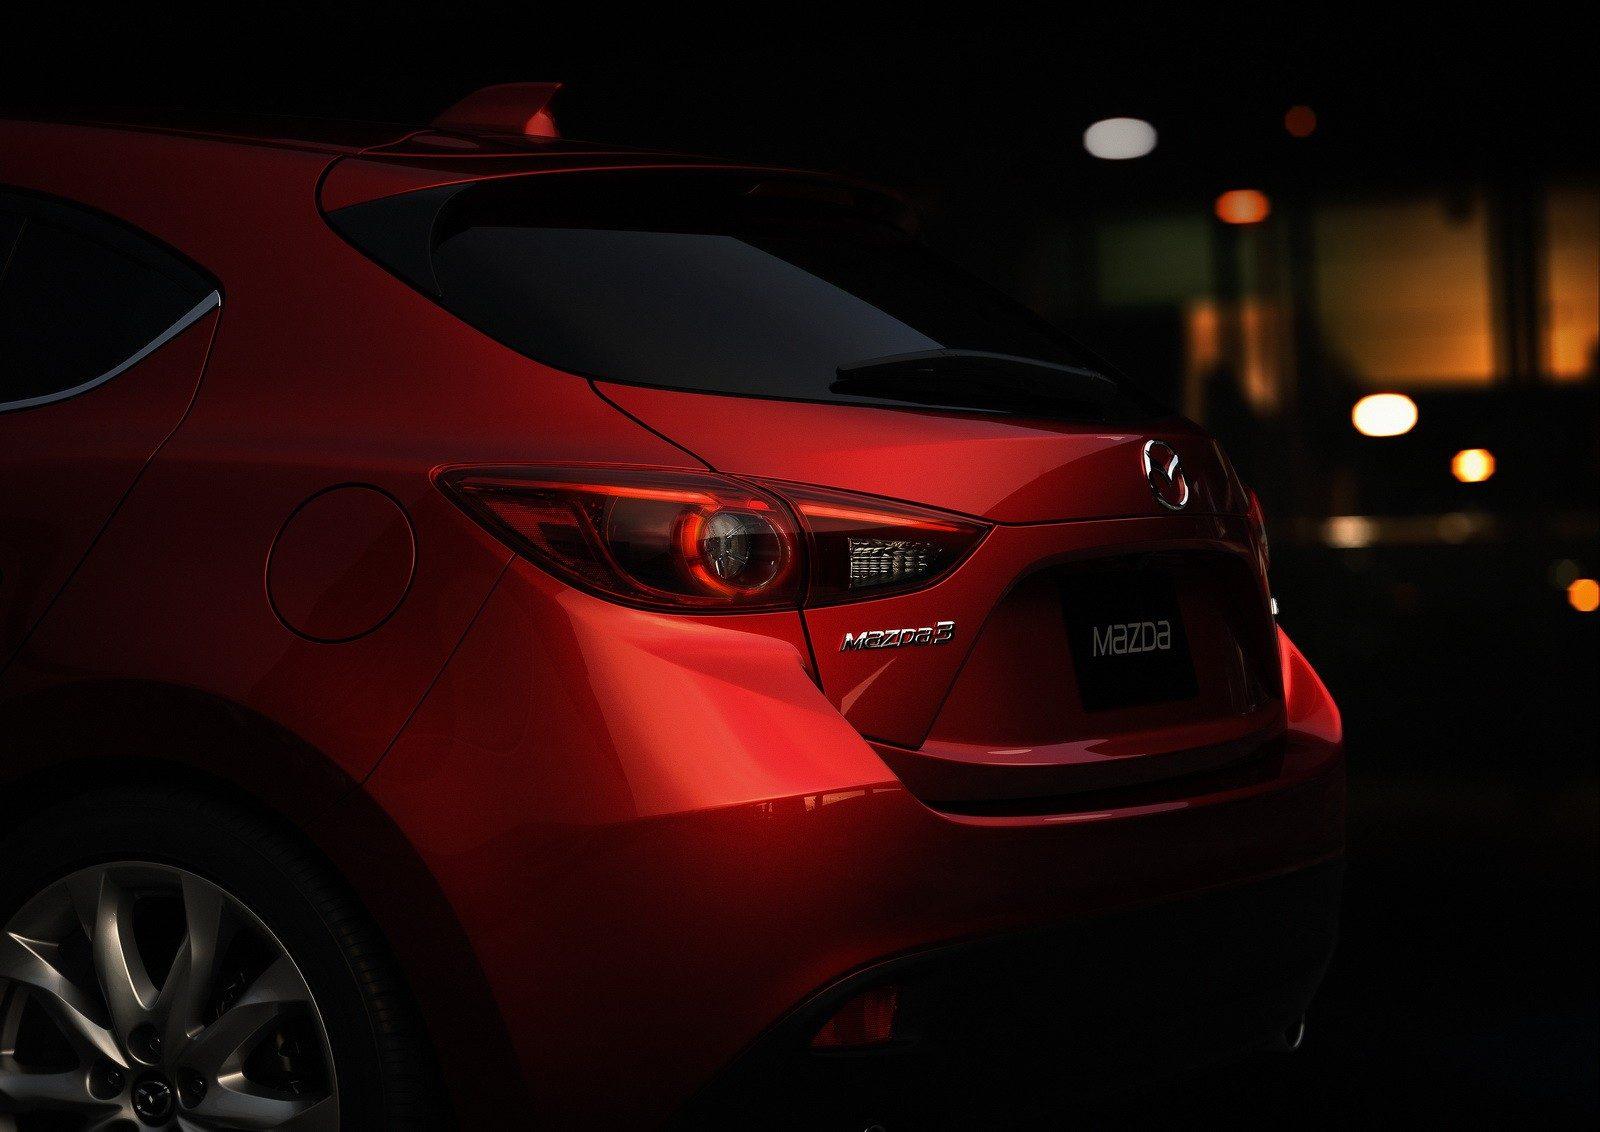 2014 Mazda3 5D NYC (41)